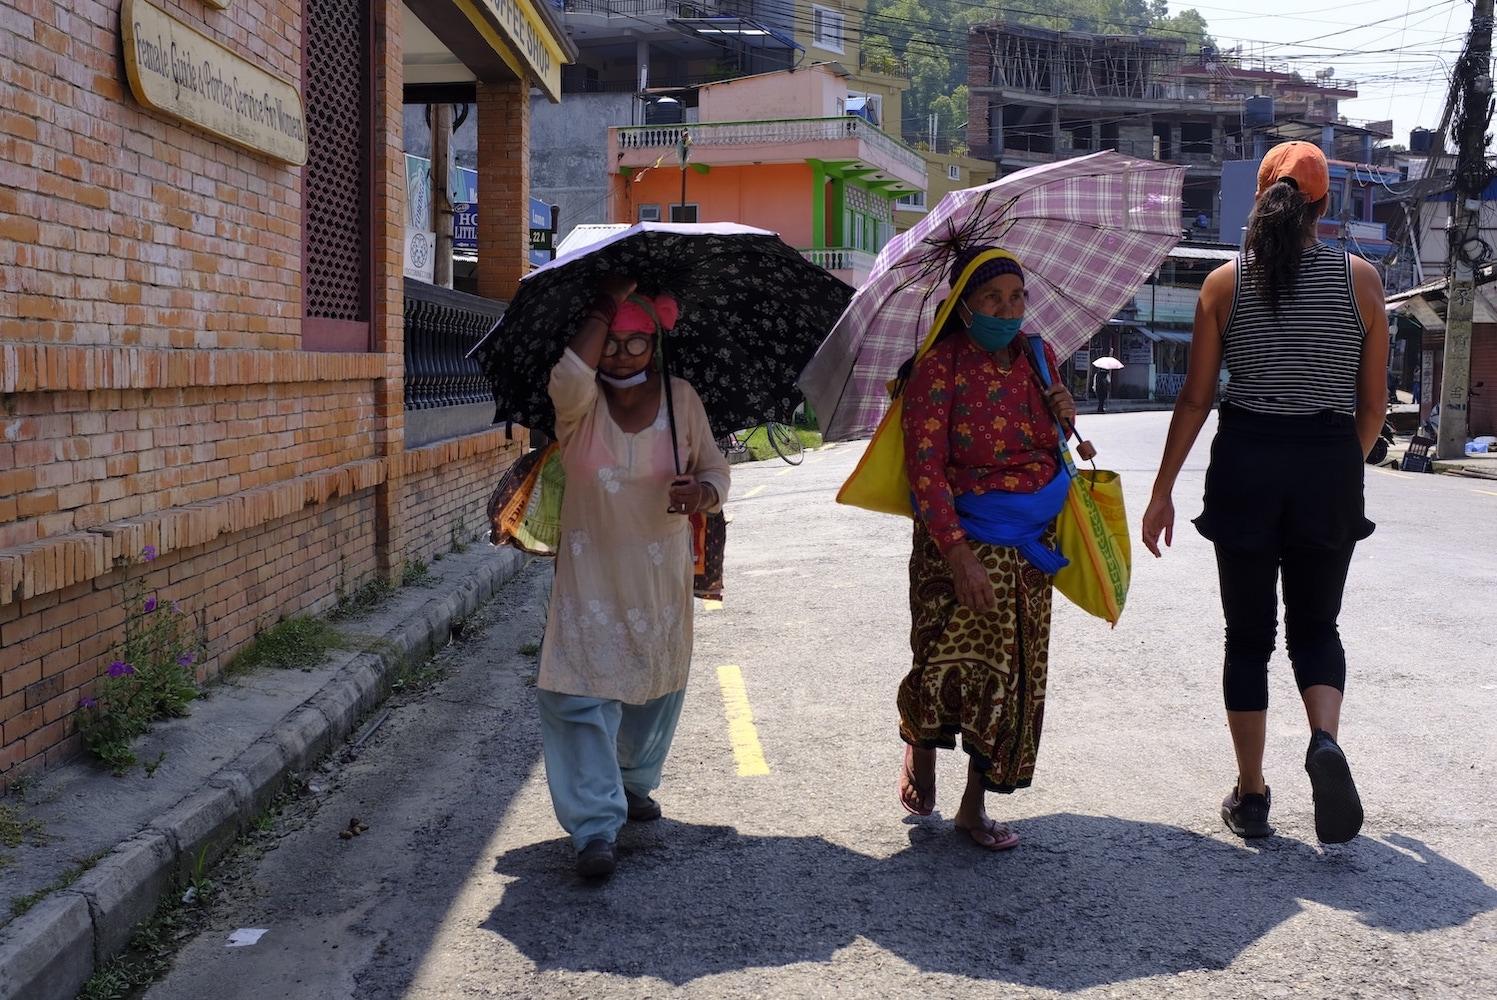 Nepali women walking with umbrella in Pokhara